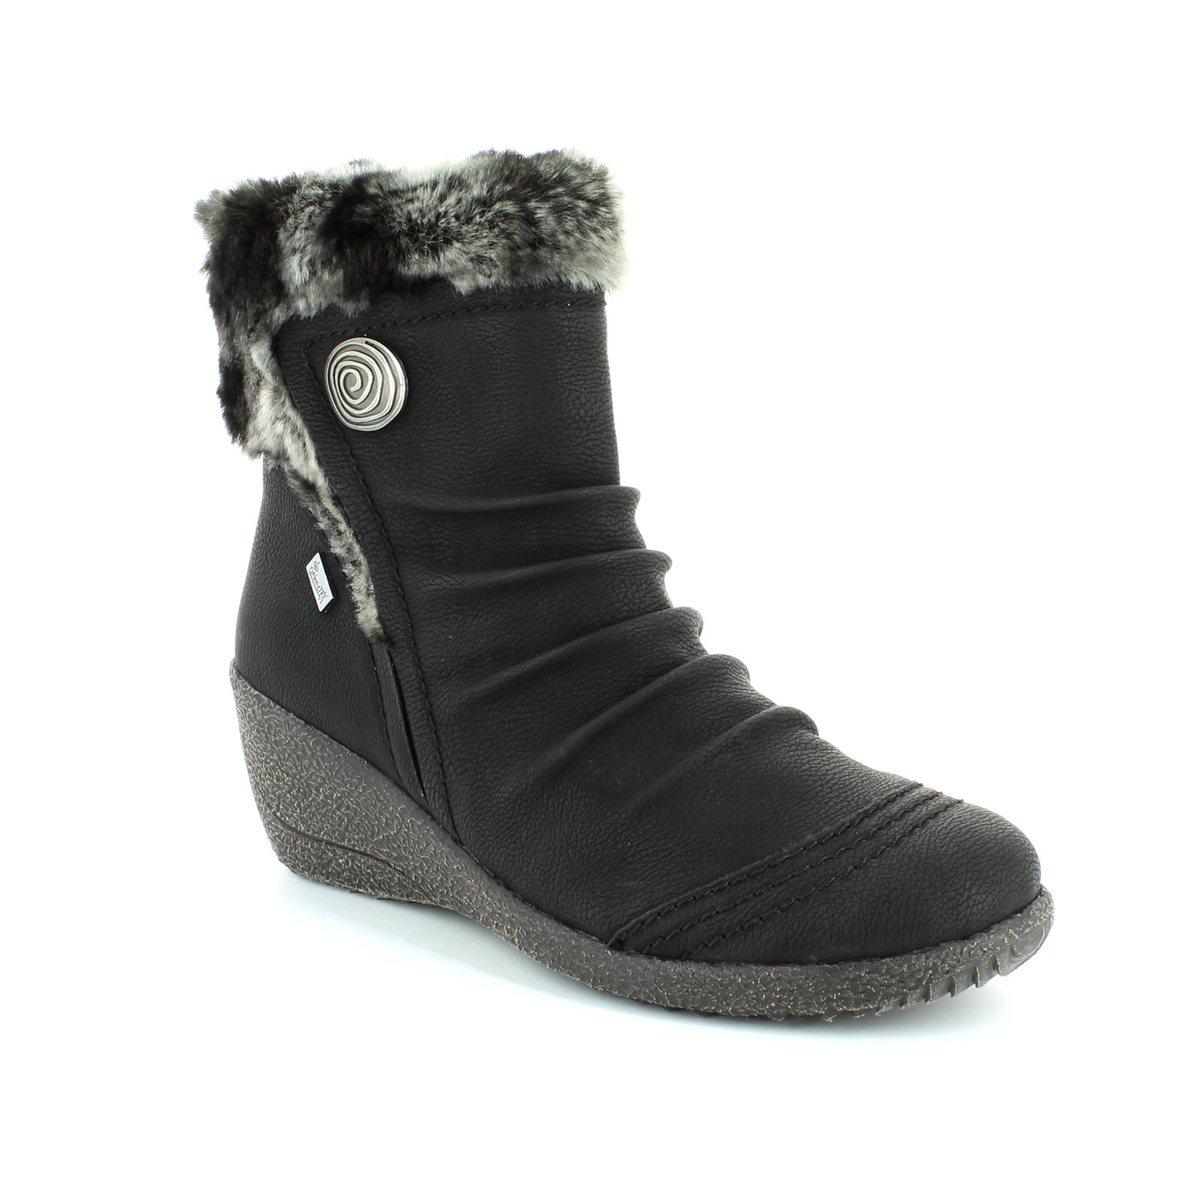 rieker y0363 01 black wedge boots